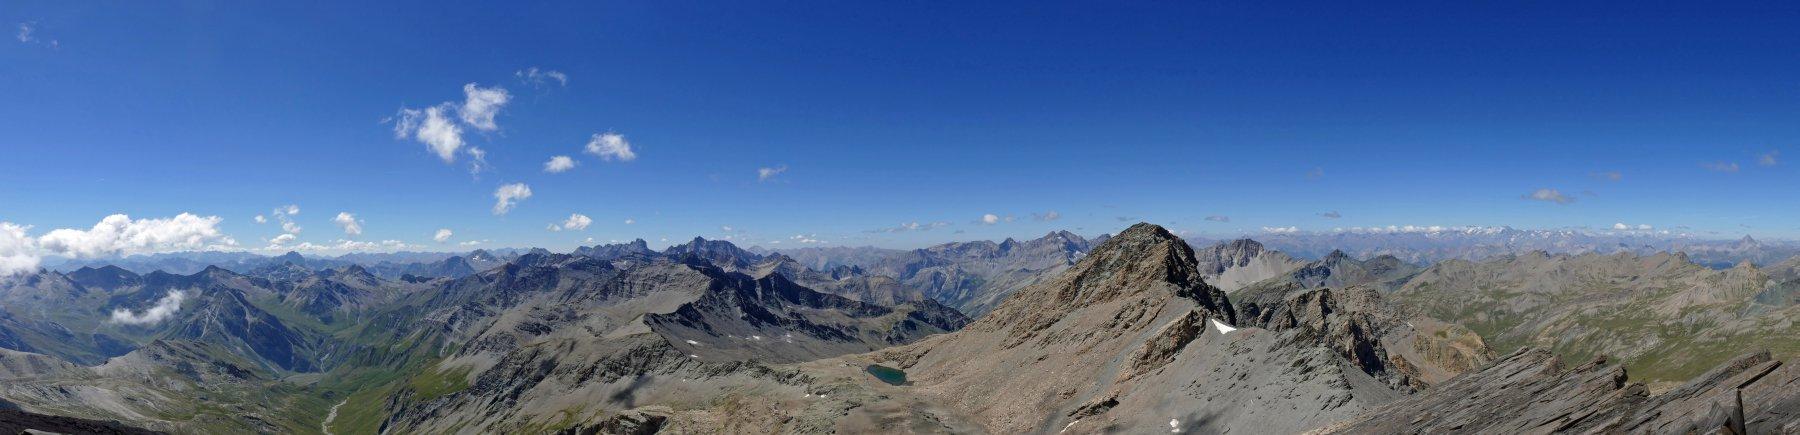 Panoramica dal monte Salza